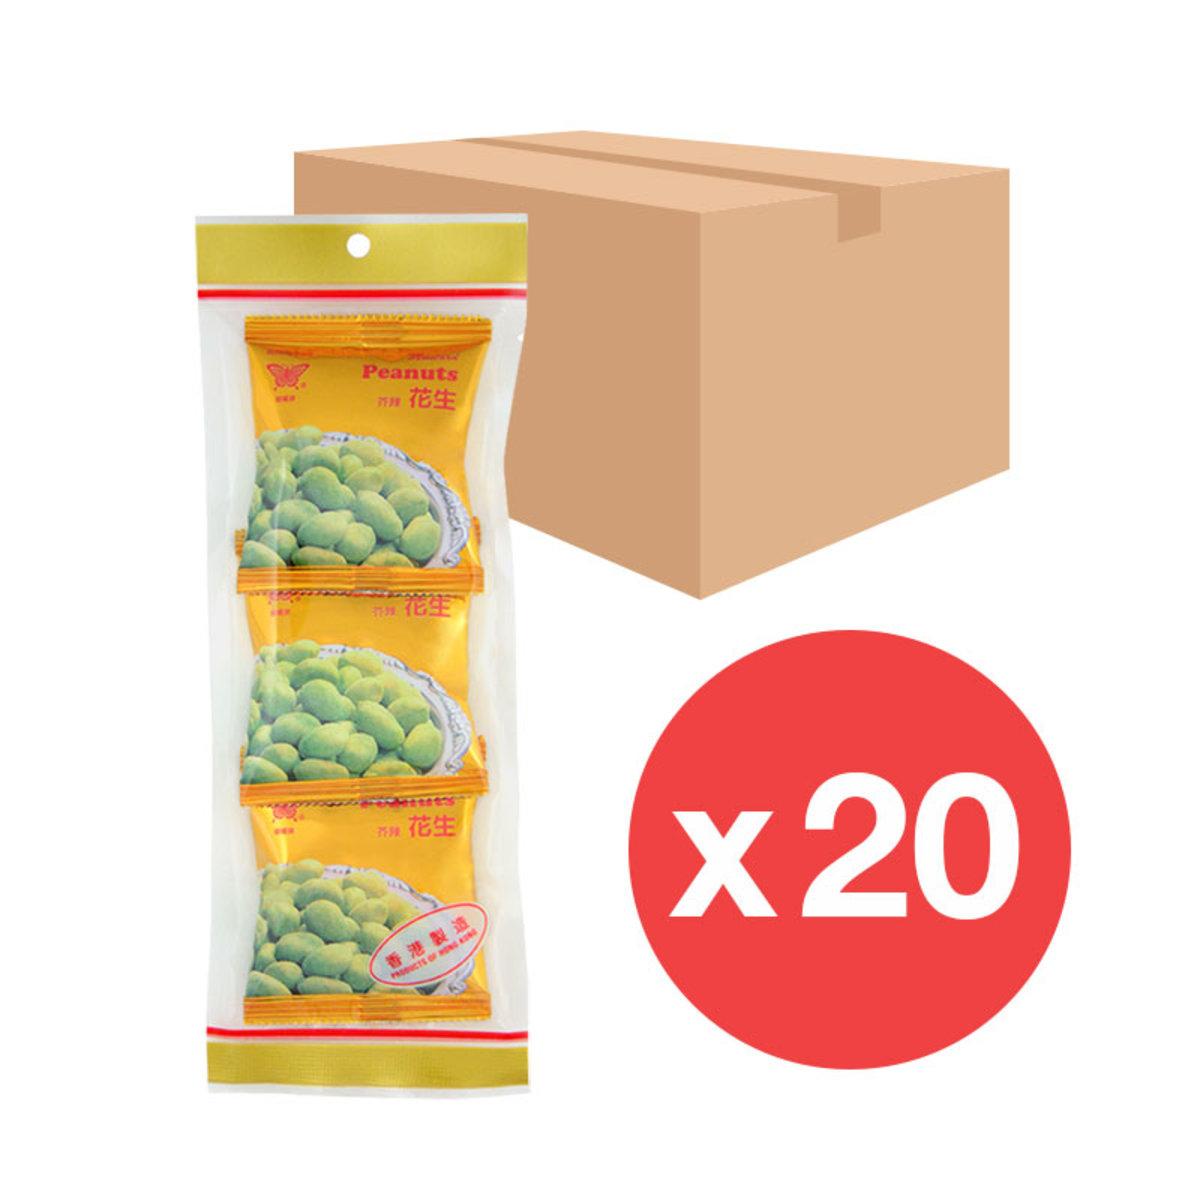 [Full case 20 bags] Wasabi Peanuts